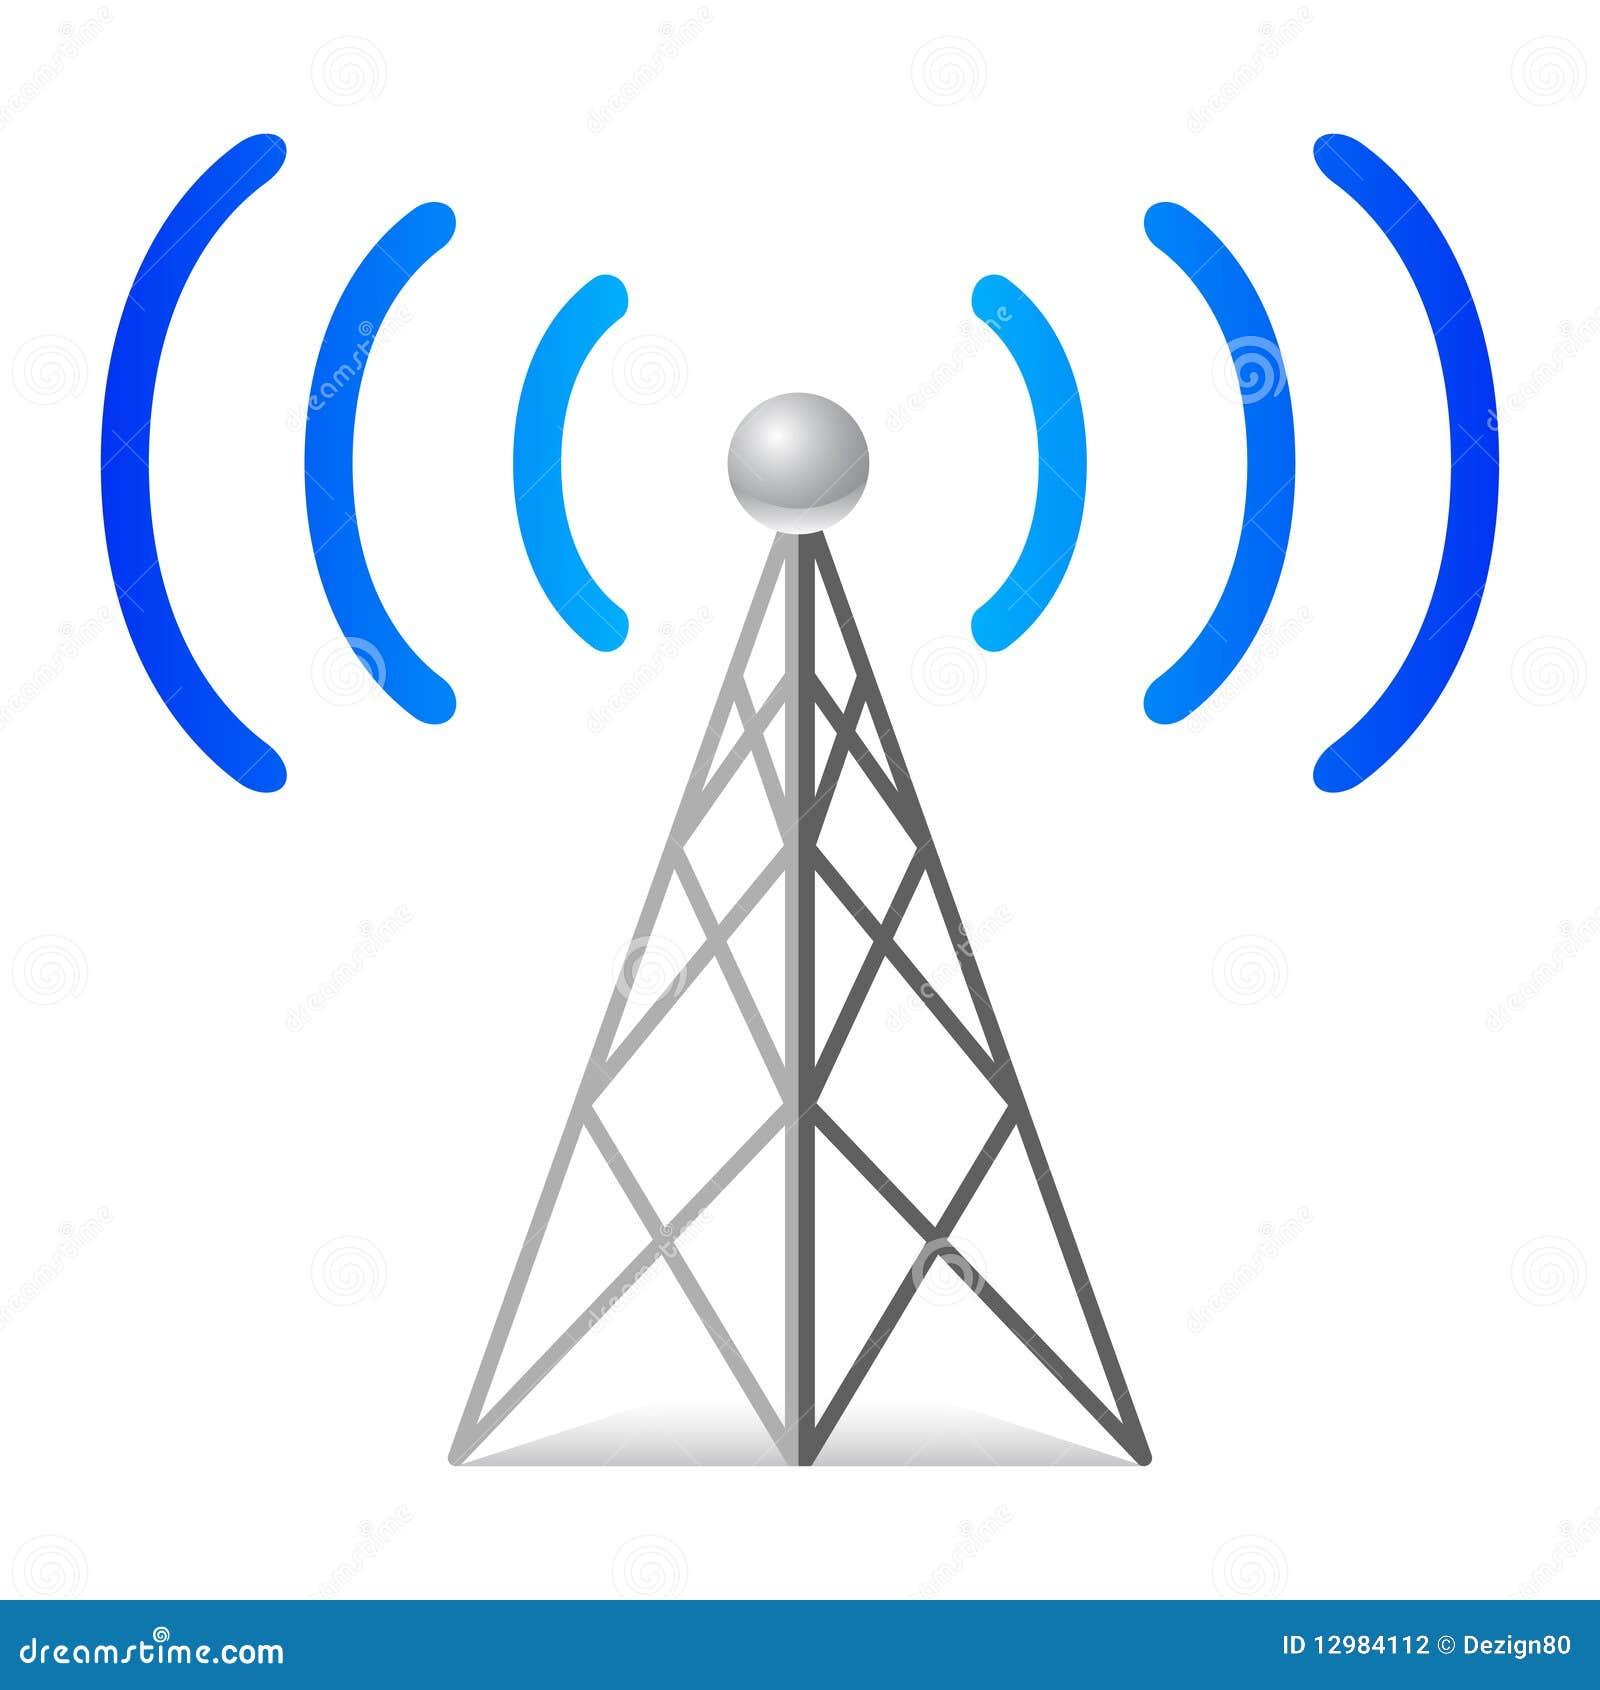 verizon wireless cell towers photo album wire diagram images wireless cell phone tower diagram wireless wiring diagram wireless cell phone tower diagram wireless wiring diagram